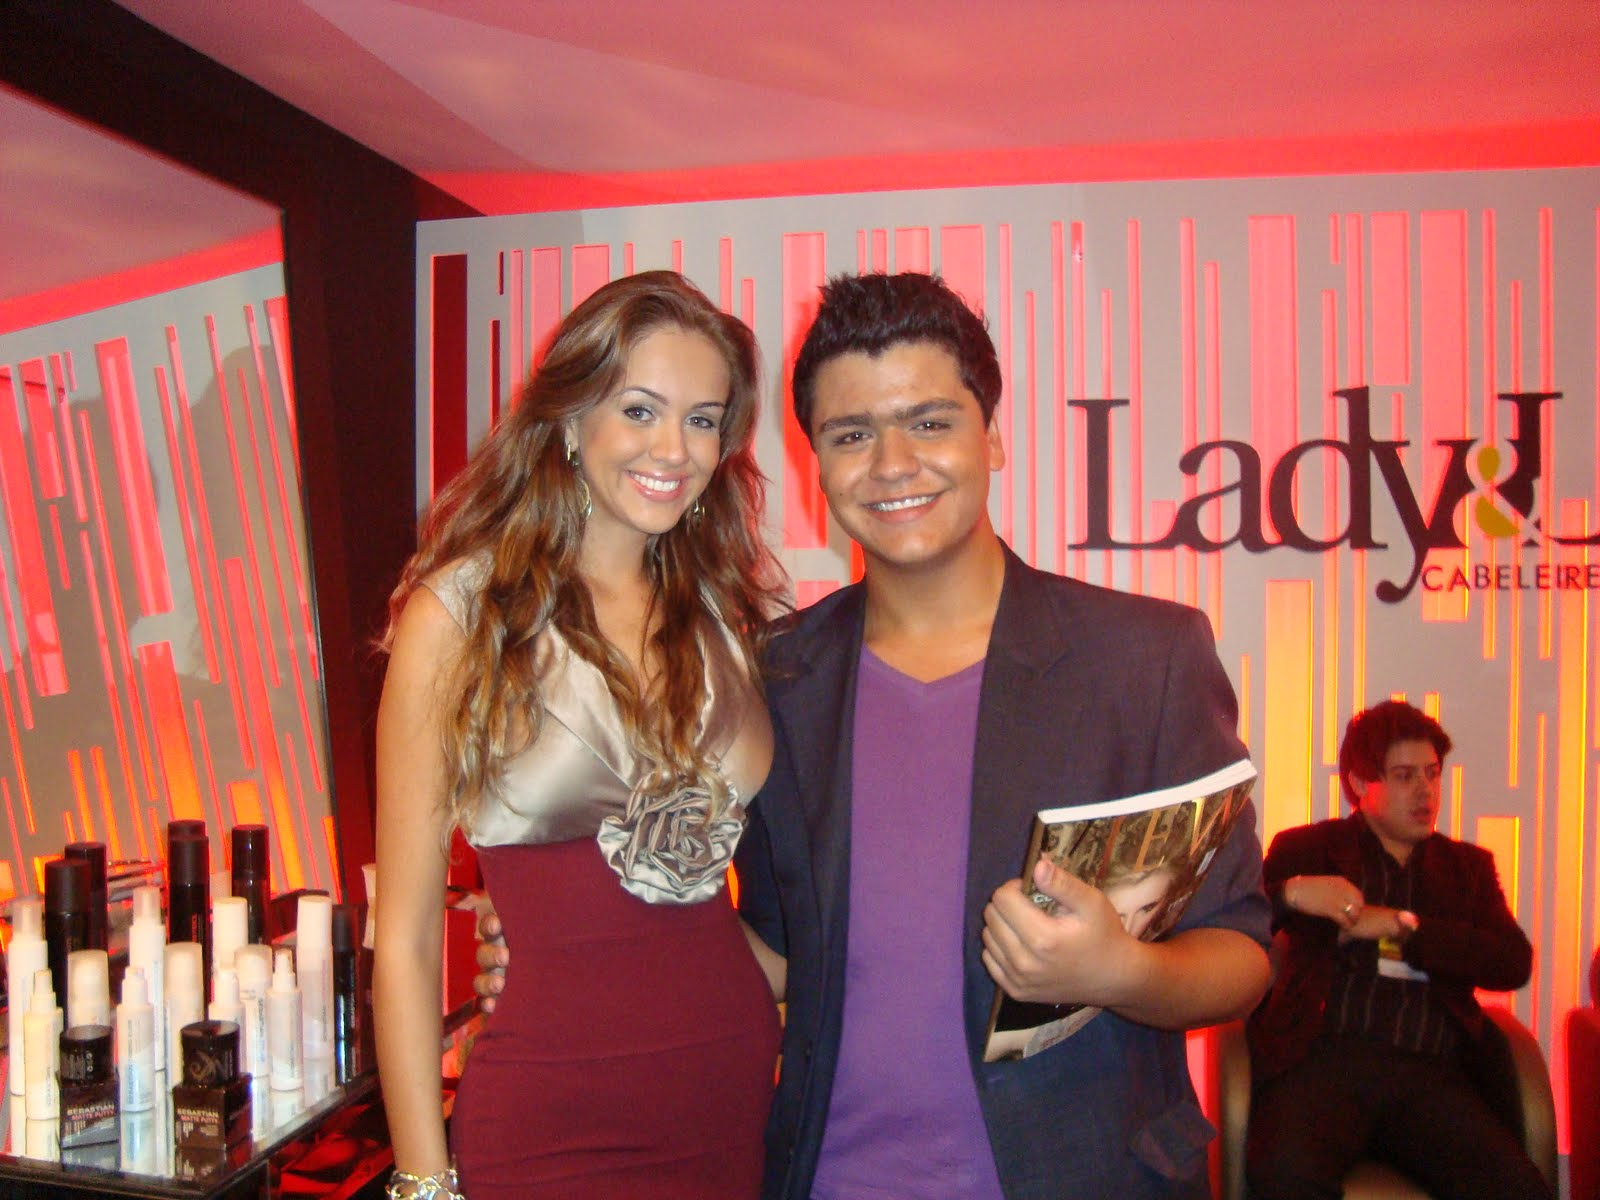 marylia bernardt, miss brasil continente americano 2010. - Página 2 6wj975u6